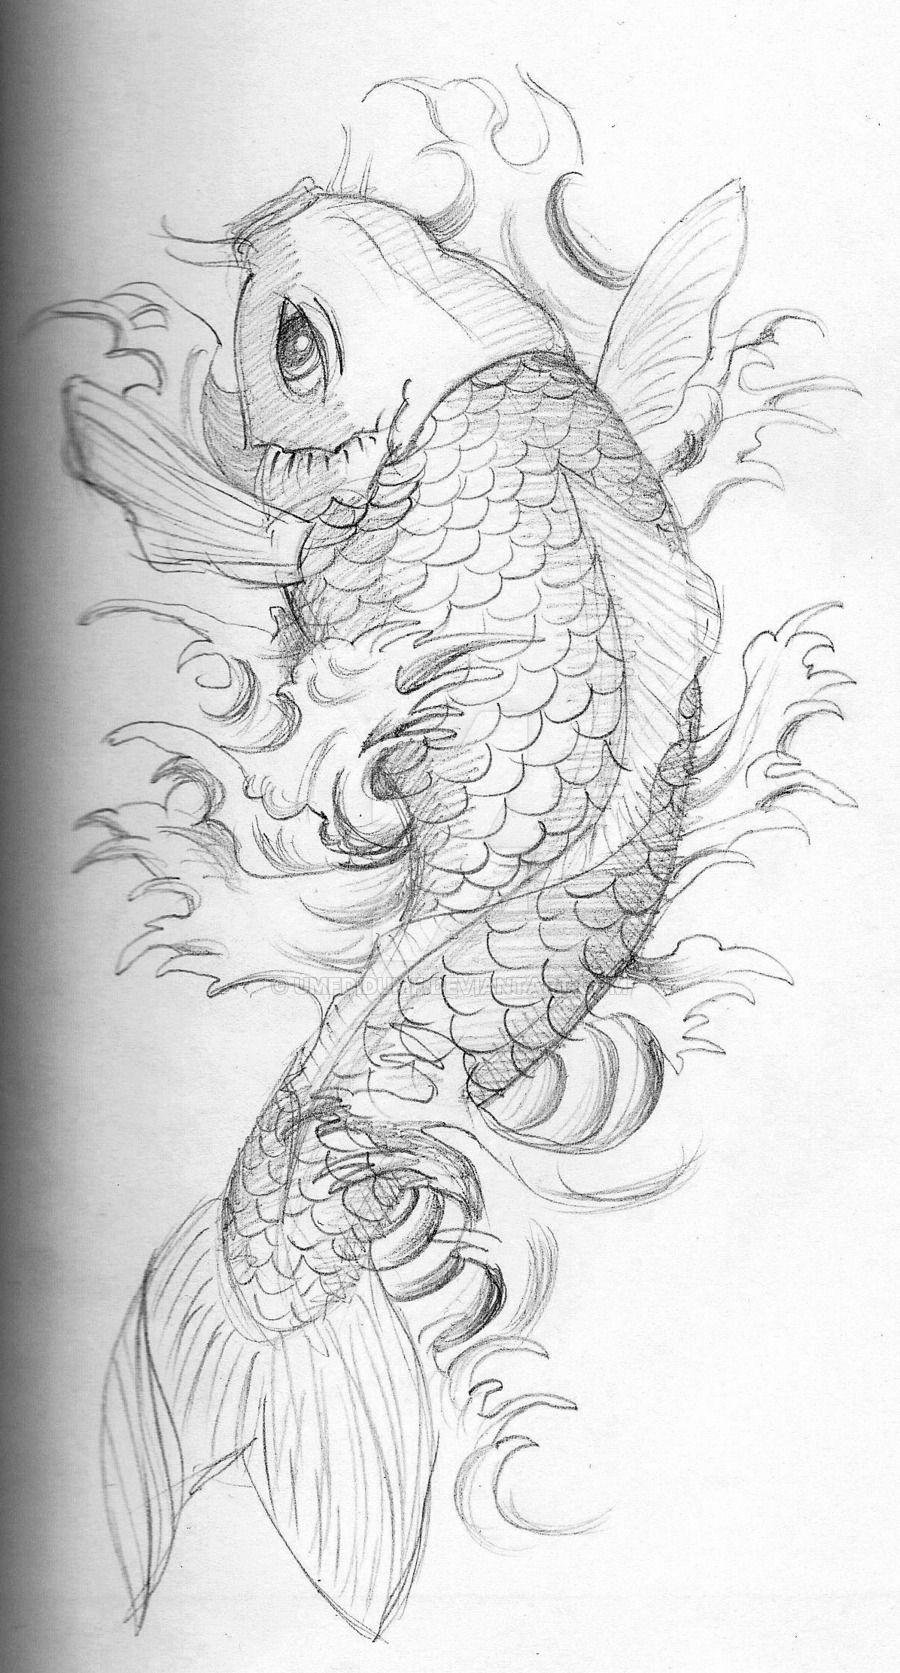 Pin by samantha on drawings pinterest koi sketches and deviantart koi sketch izmirmasajfo